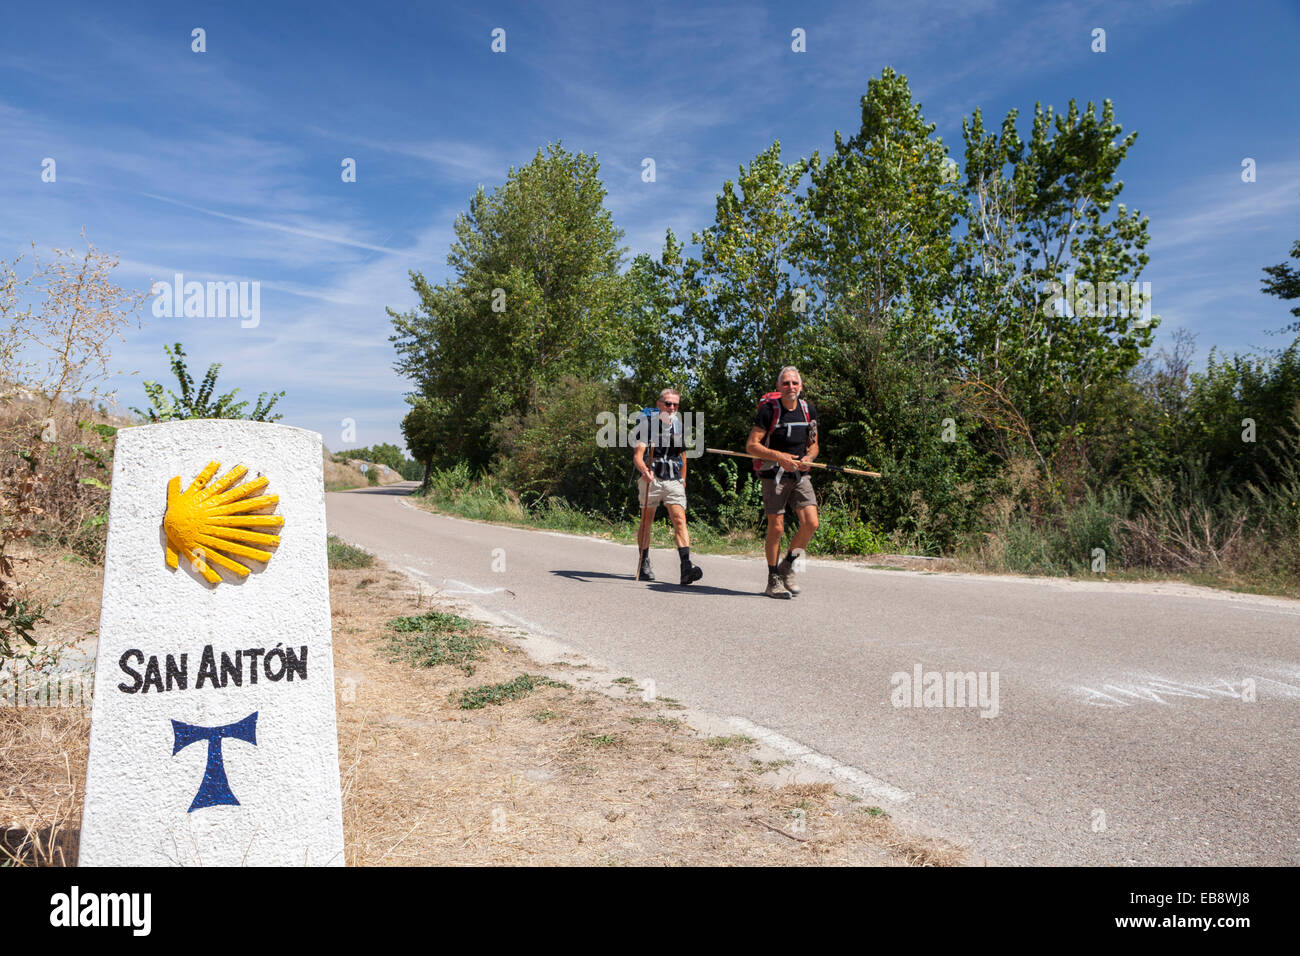 Way of St. James near the ruins of the Monastery of San Anton,  Castrojeriz, Burgos, Spain - Stock Image